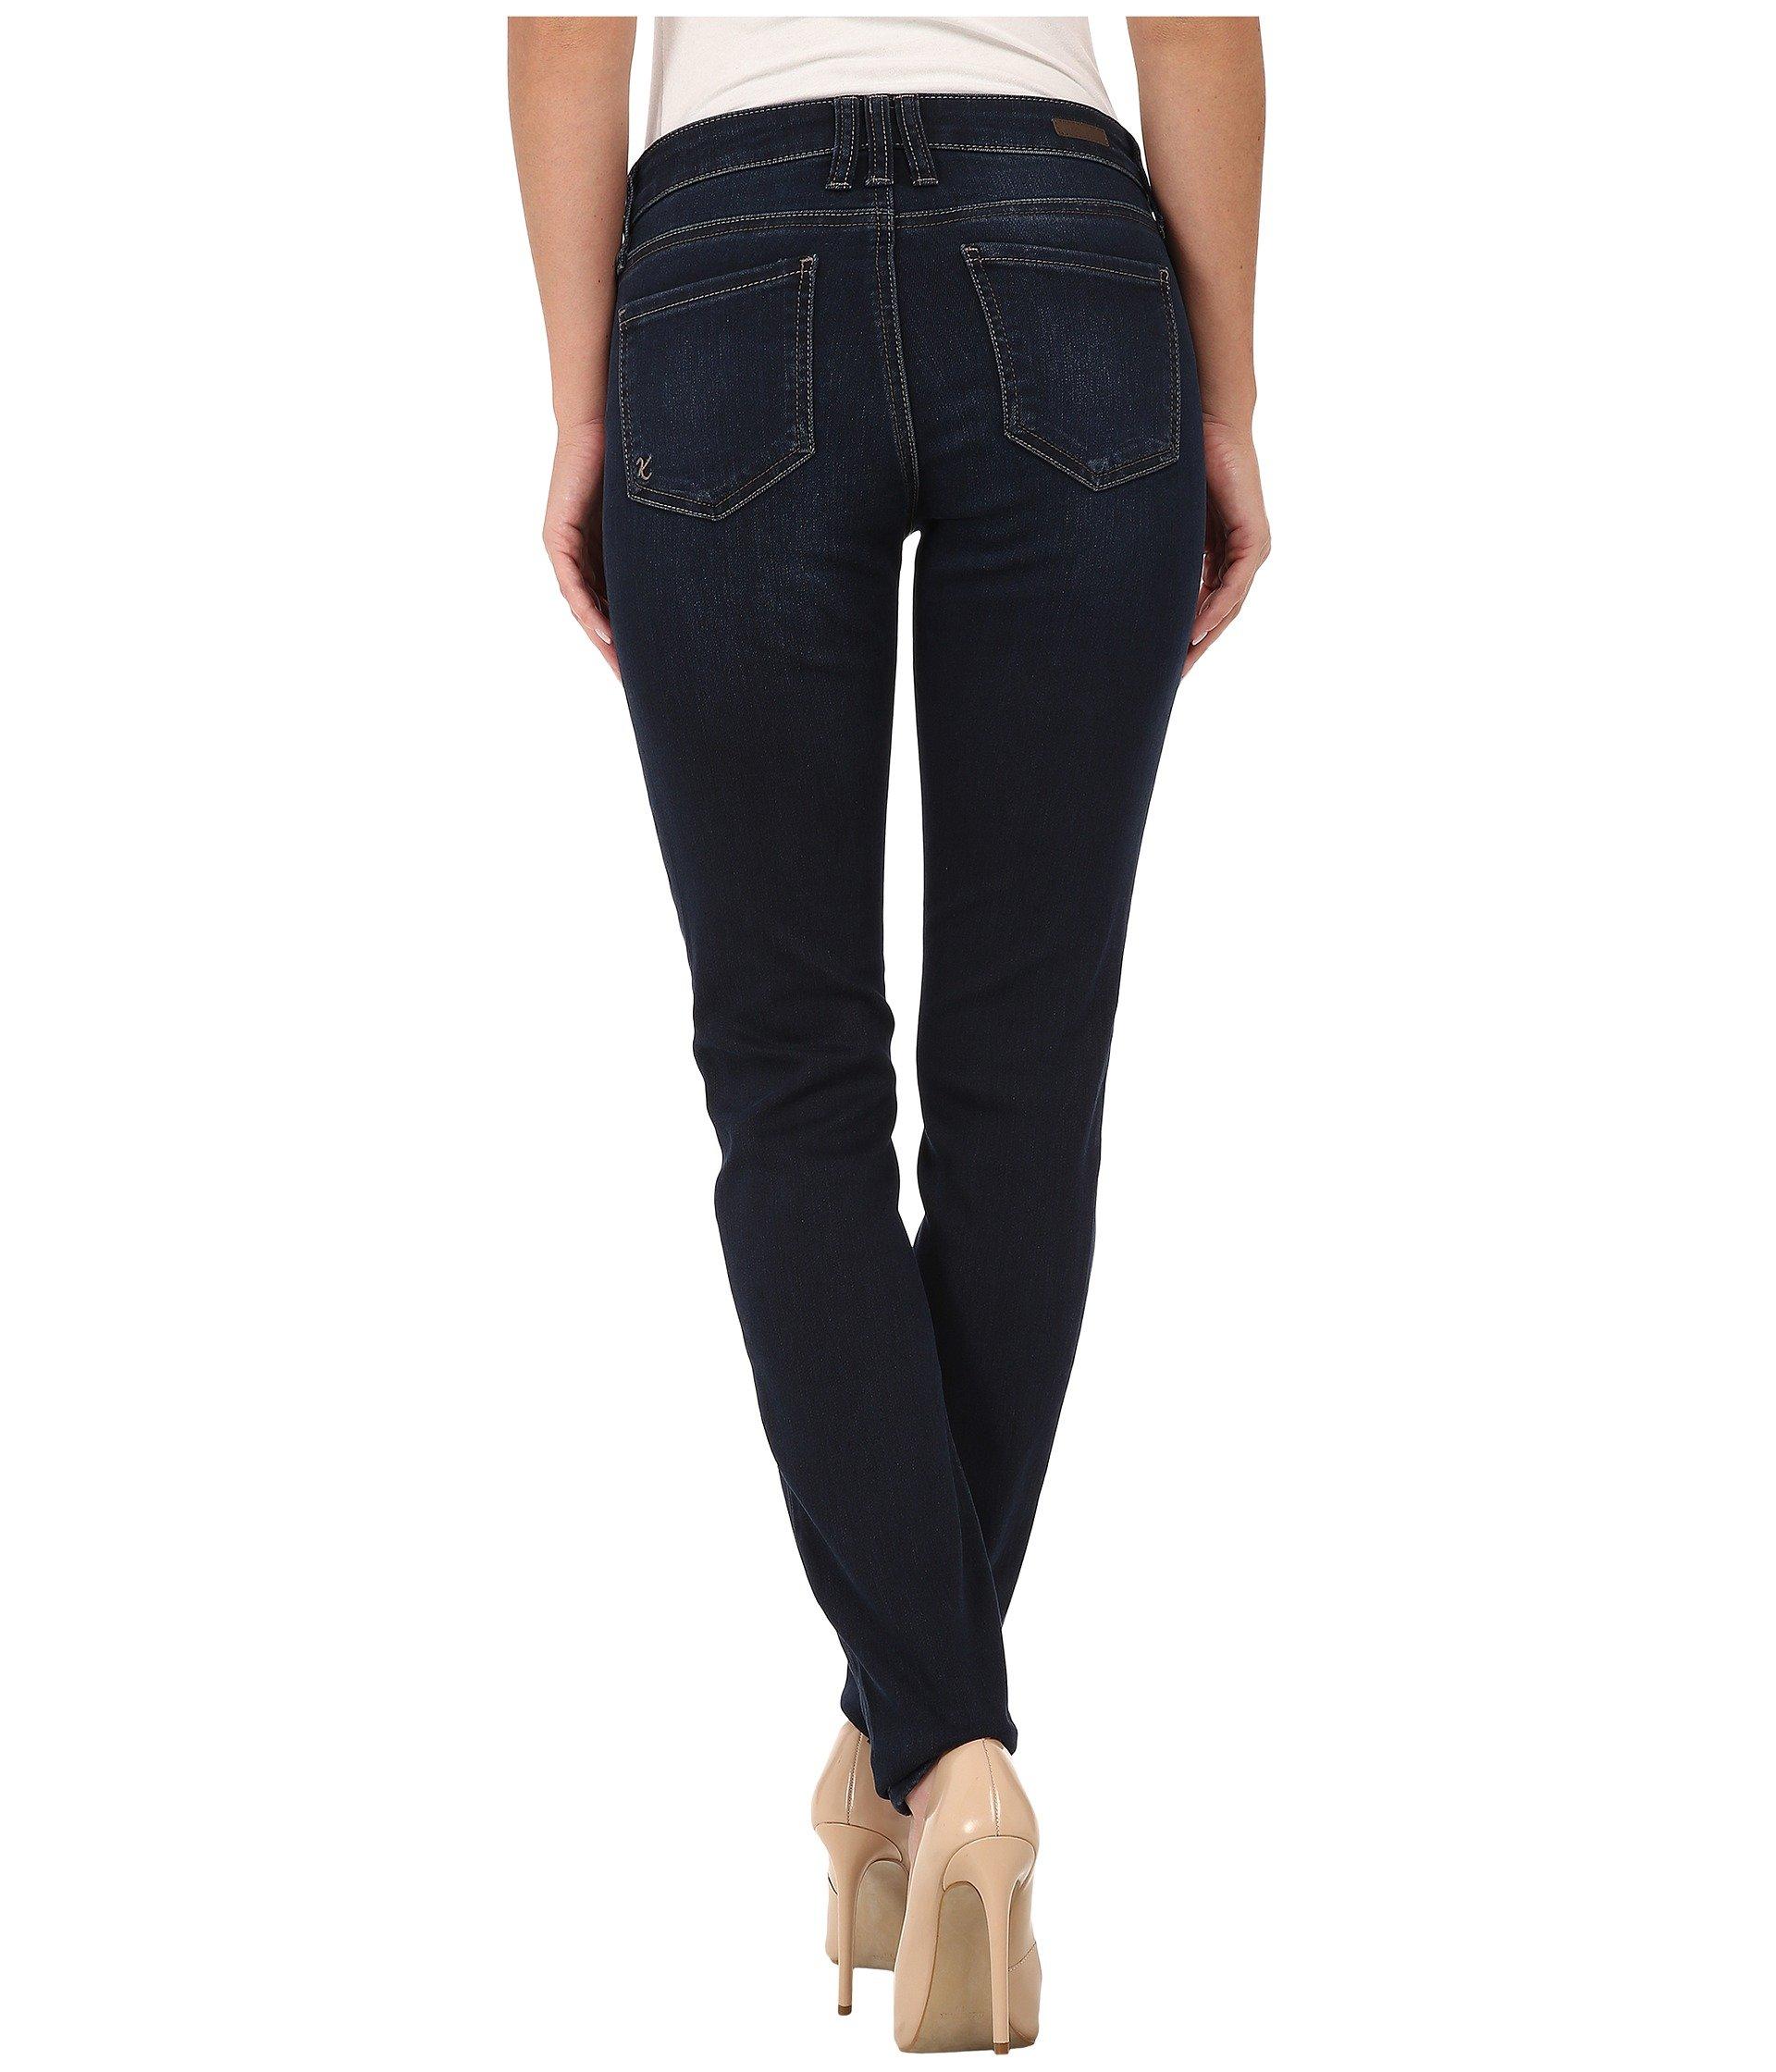 Do hudson skinny jeans run small